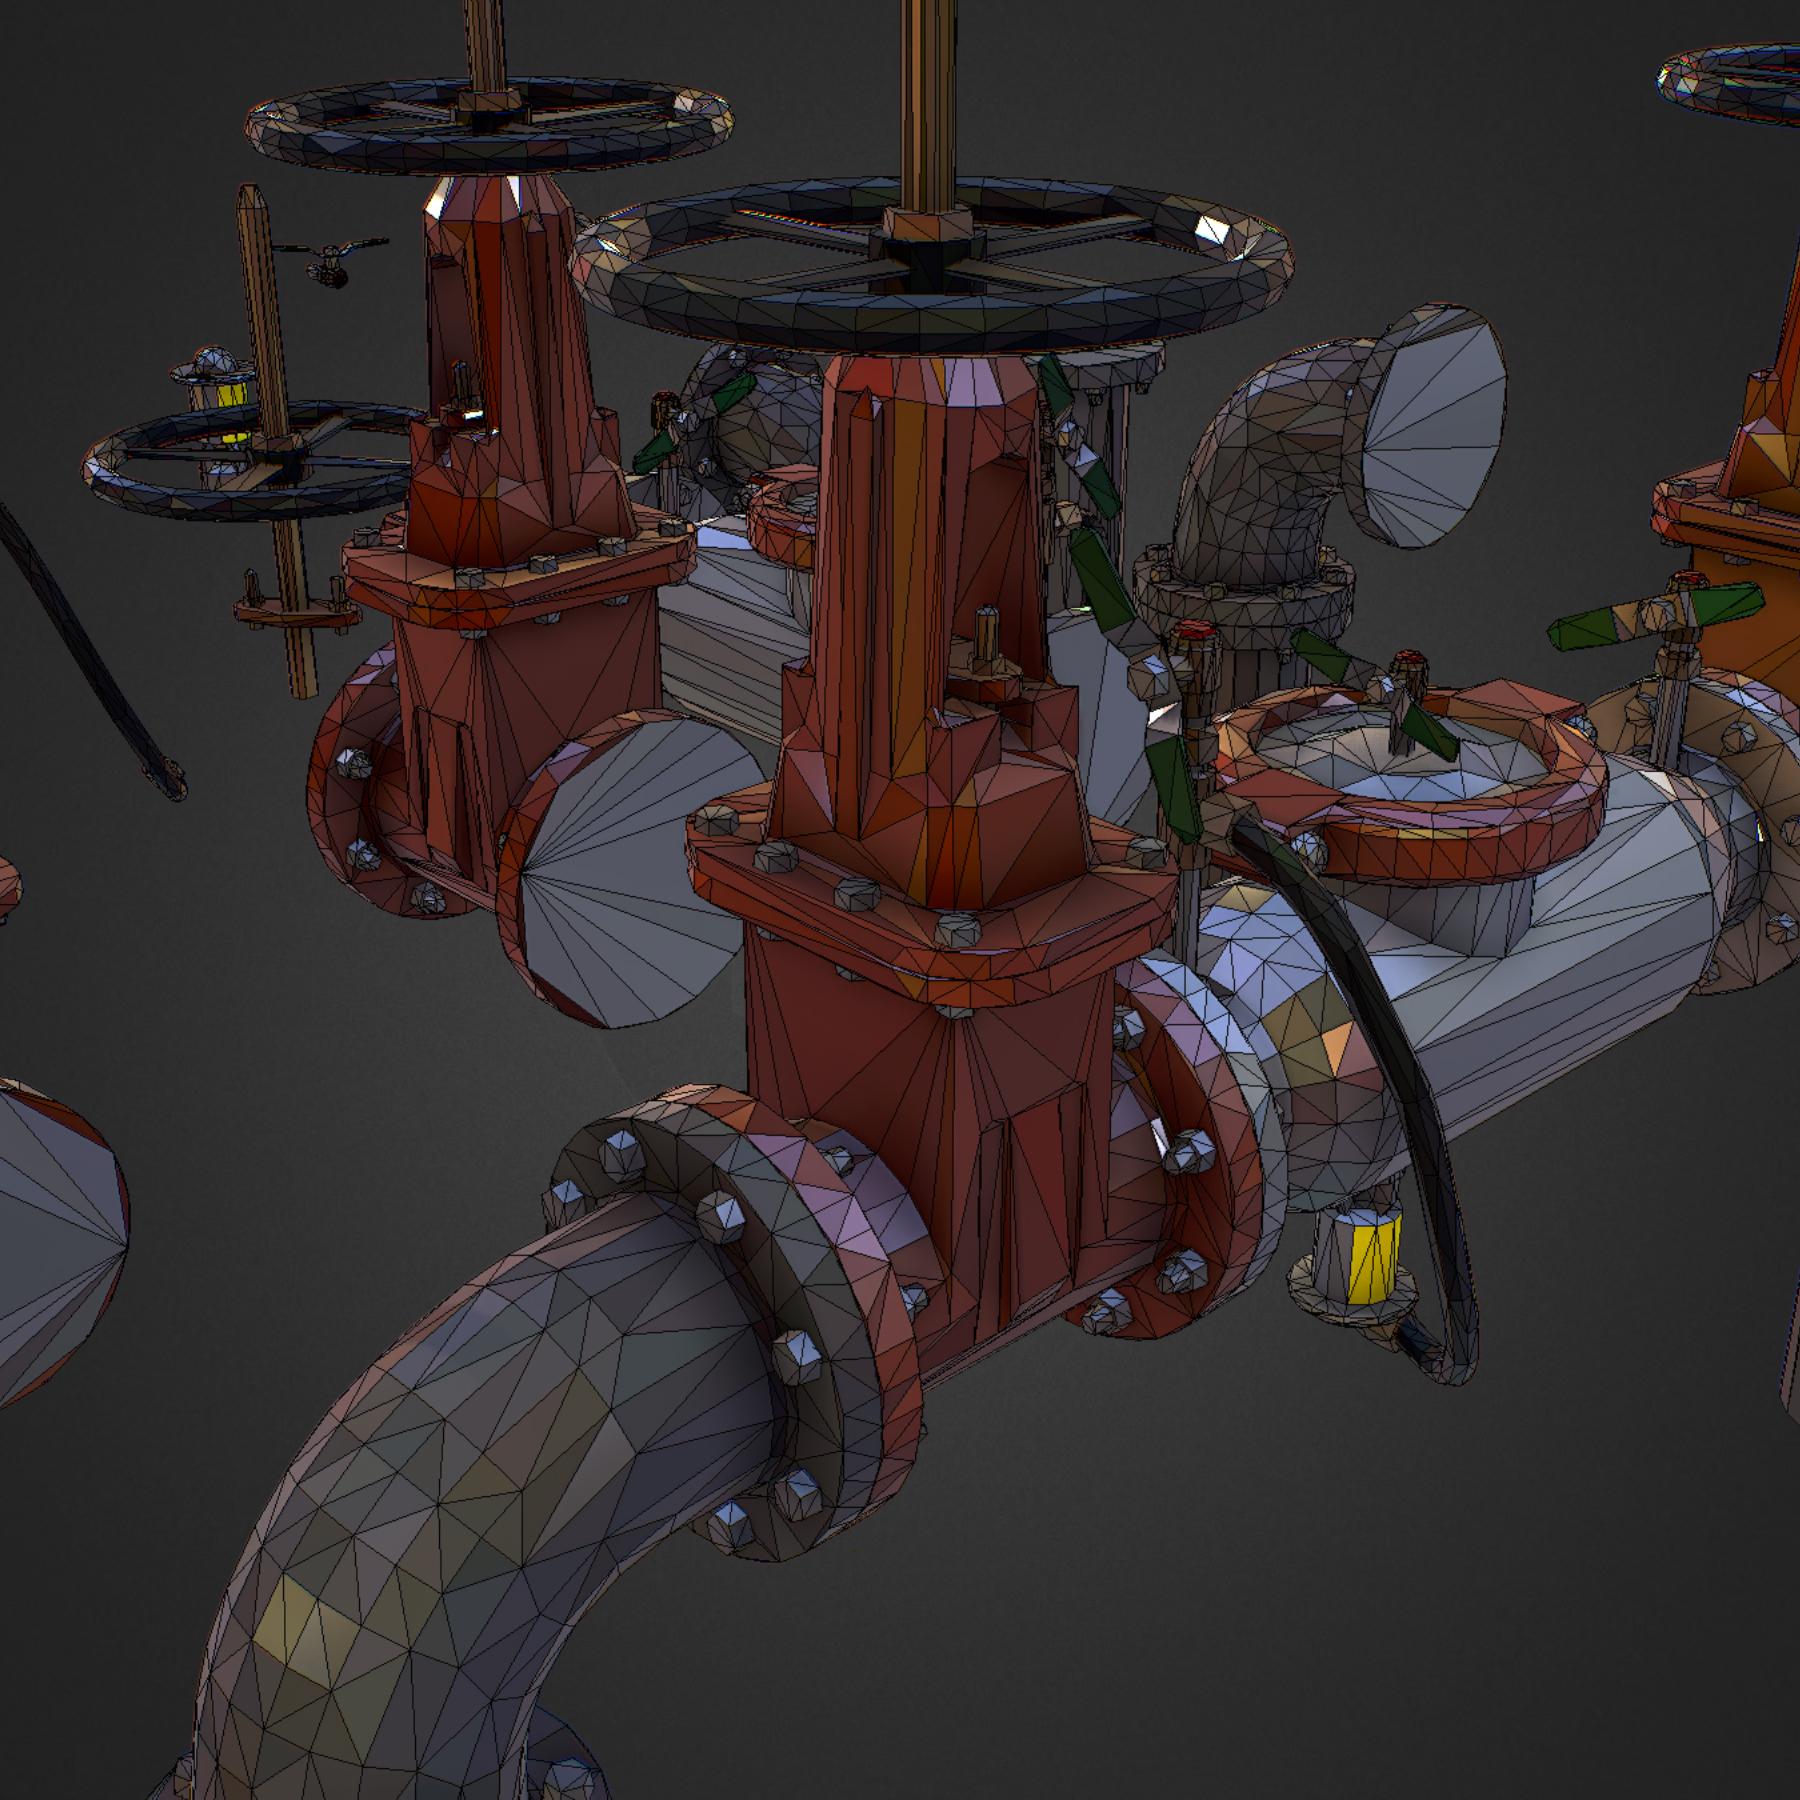 Low Poly ART Backflow Water Pipe Constructor 3d model max 3ds max plugin fbx ma mb tga targa icb vda vst pix obj 272578